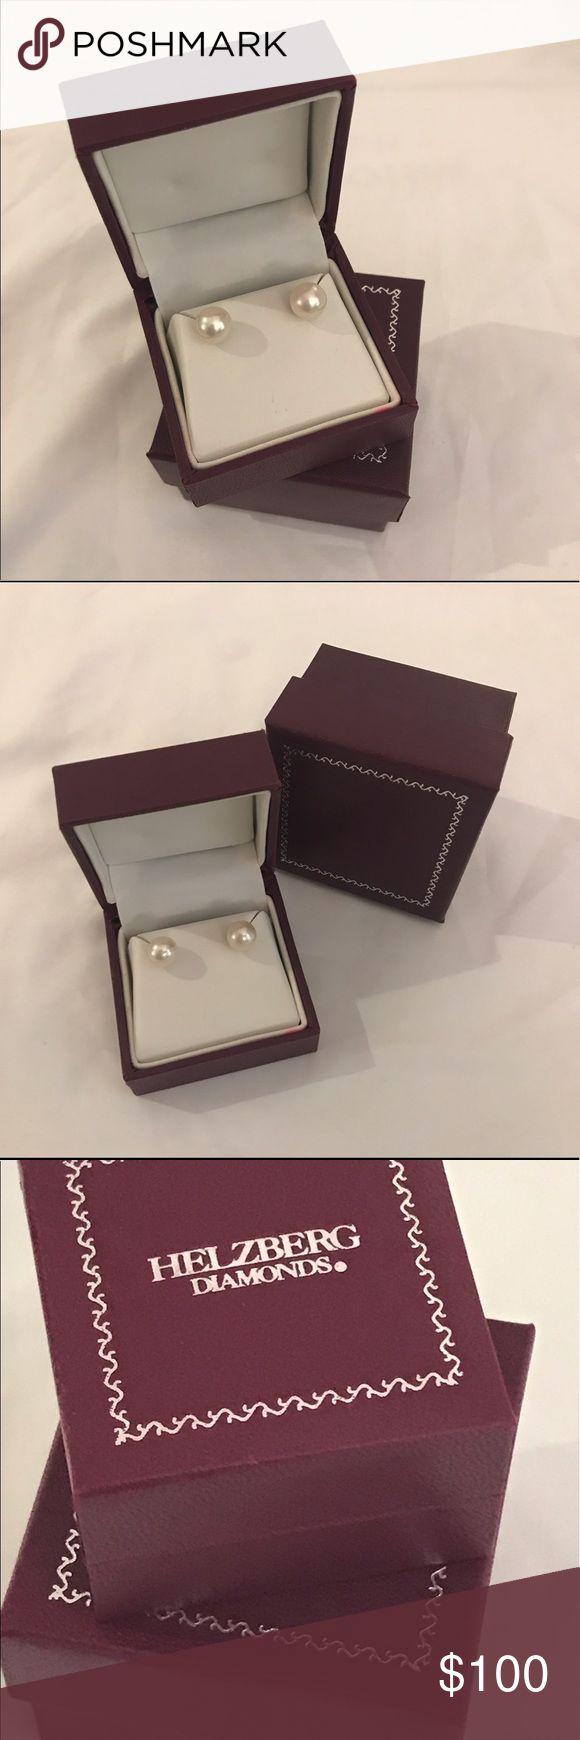 Honora Freshwater Cultured Pearl Earrings In 14K Honora Freshwater Cultured Pearl Earrings In 14K Yellow Gold 9-9.5mm NEW IN BOX FROM Helzberg Diamond Helzberg Diamond Jewelry Earrings